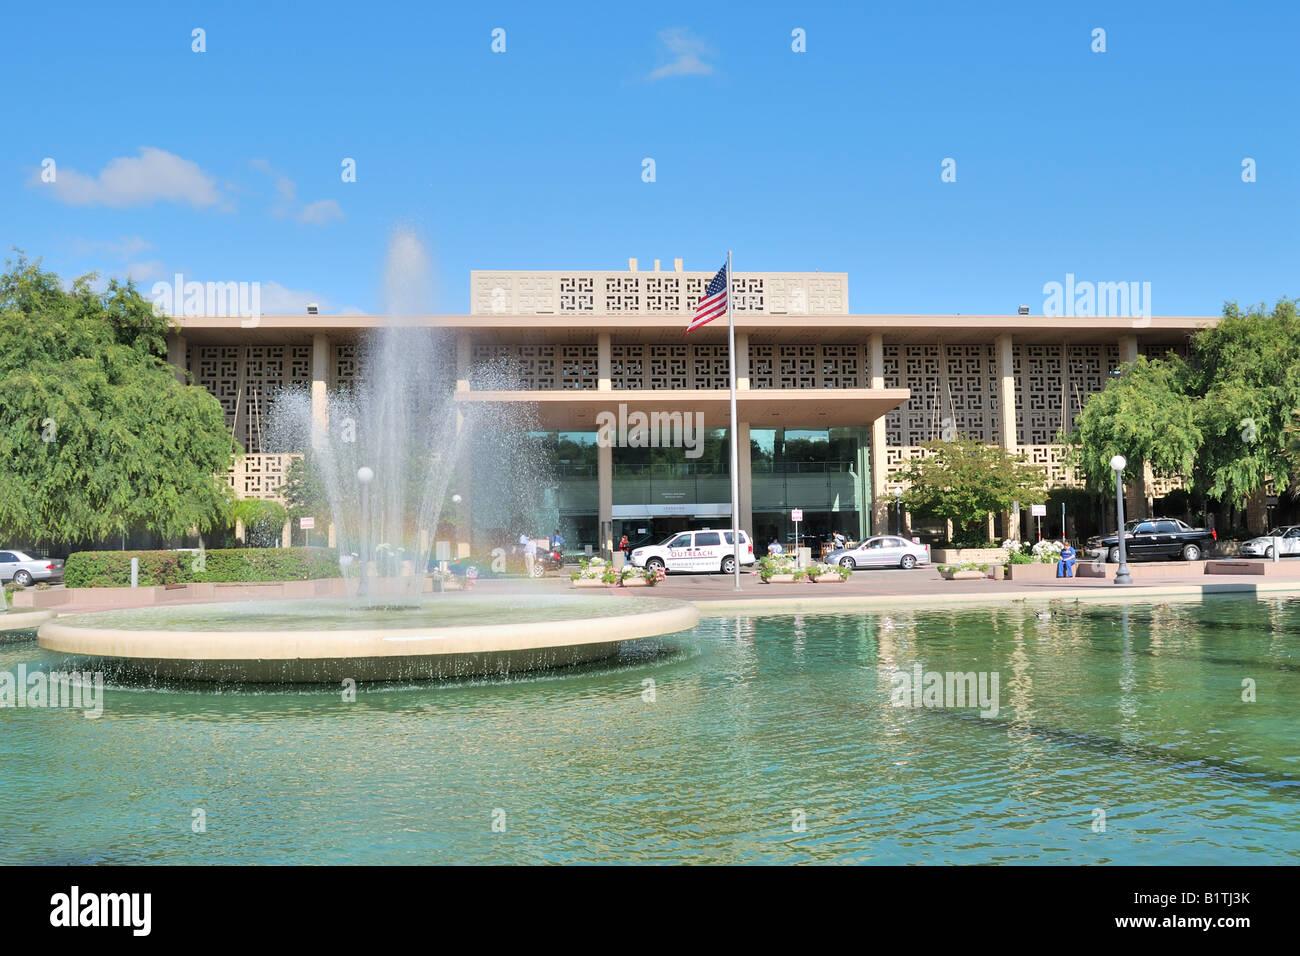 Stanford University Medical Center >> Main Entrance To The Medical Center At Stanford University